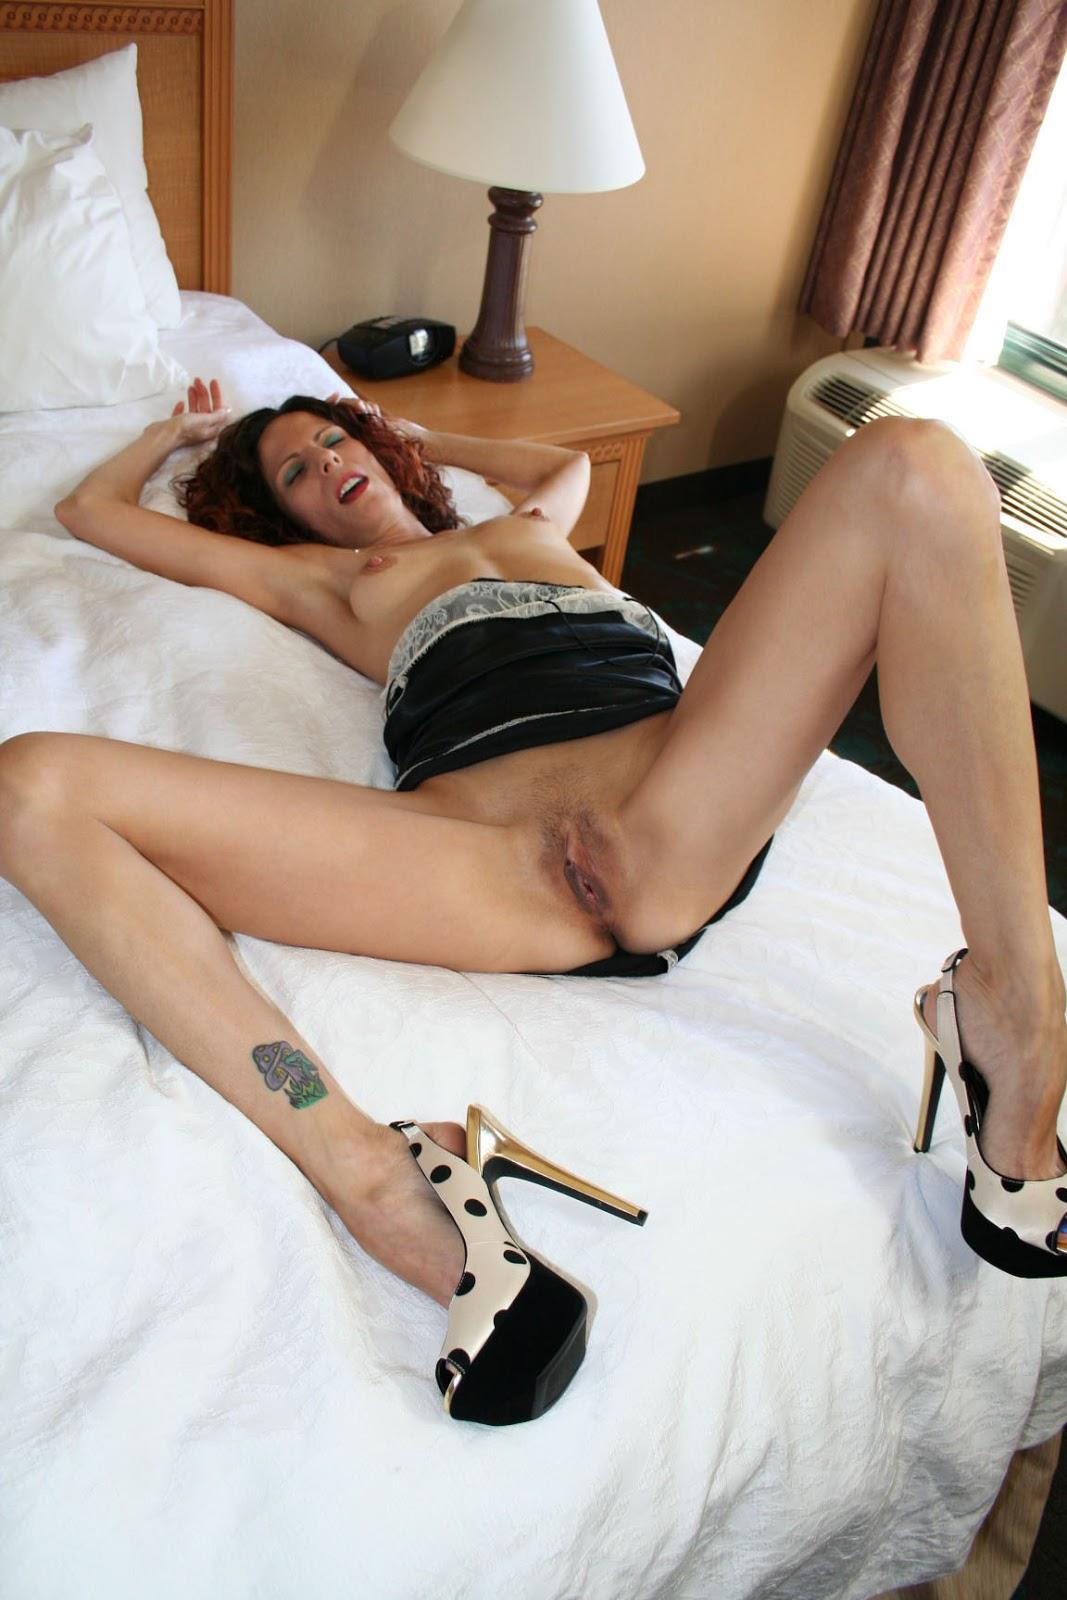 Skinny stacey porn